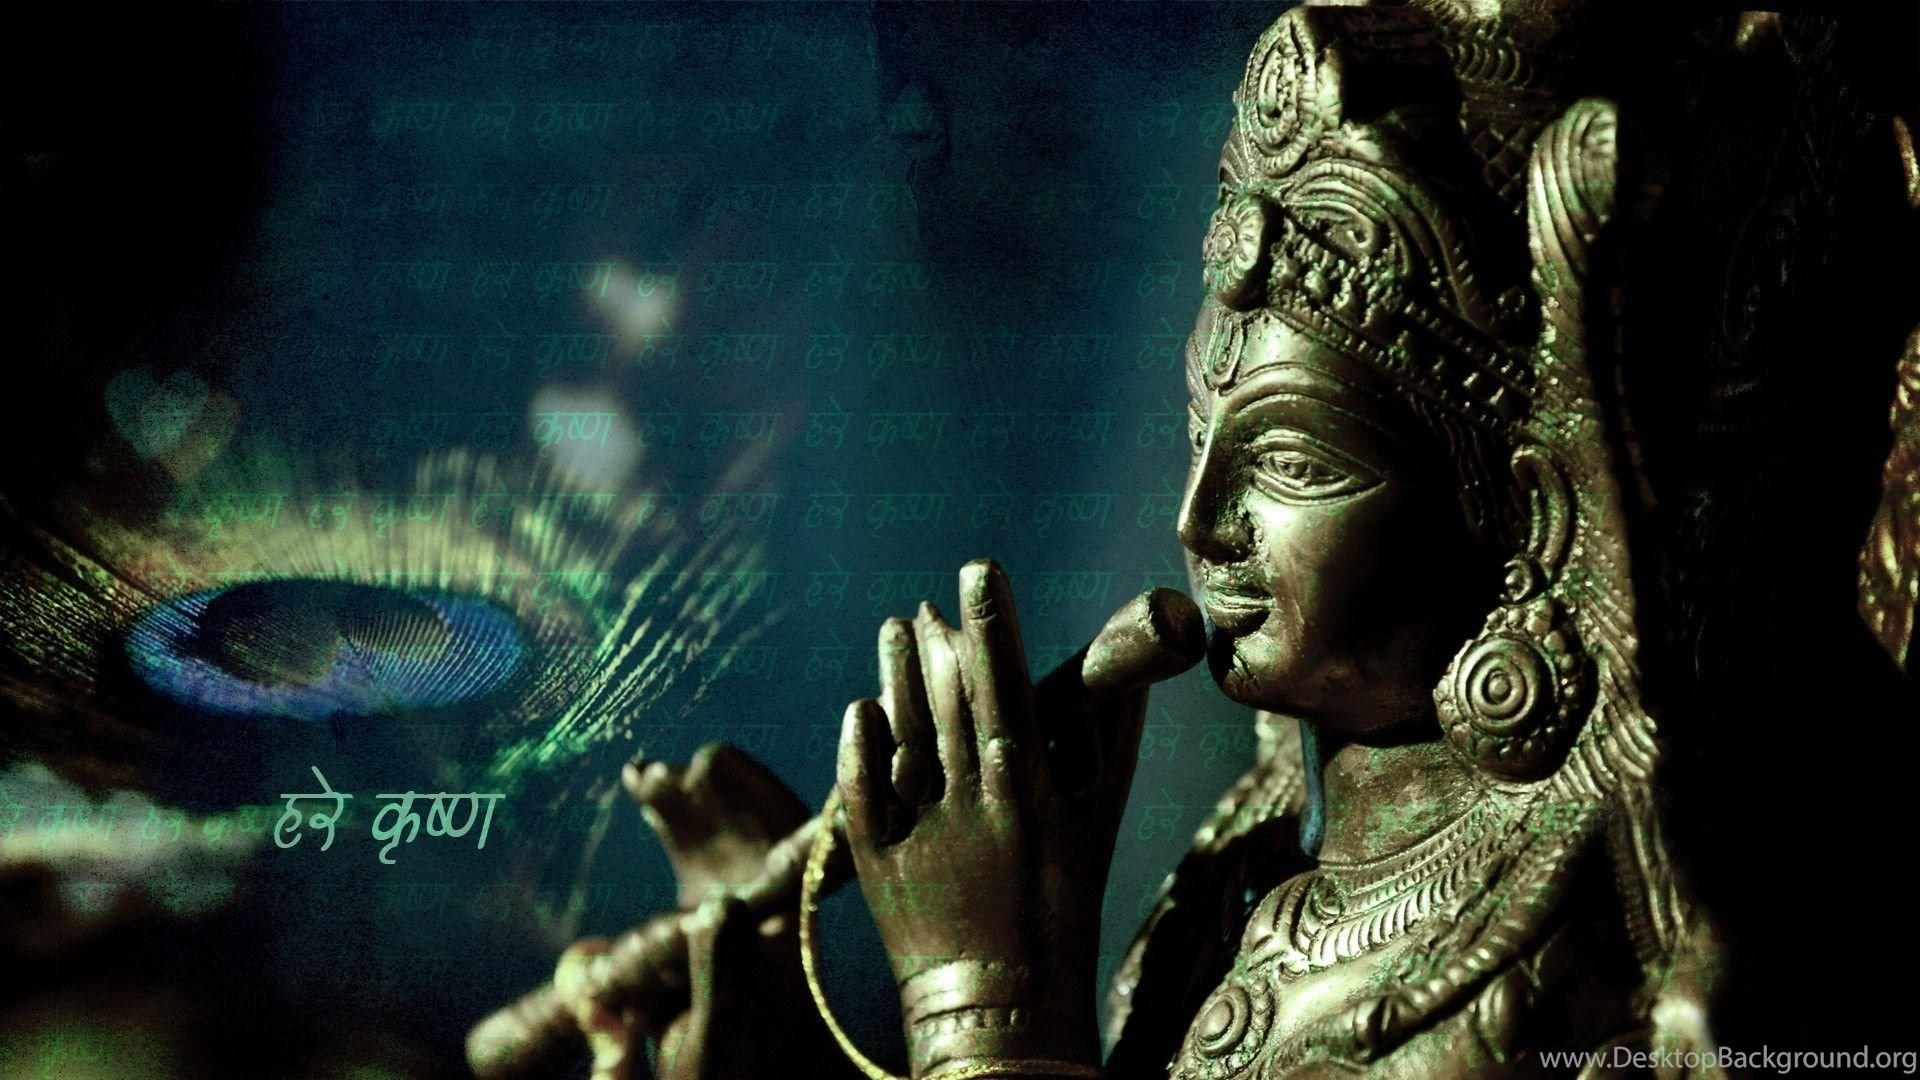 Lord Krishna Wallpapers 2015 Wallpapers Cave Desktop Background